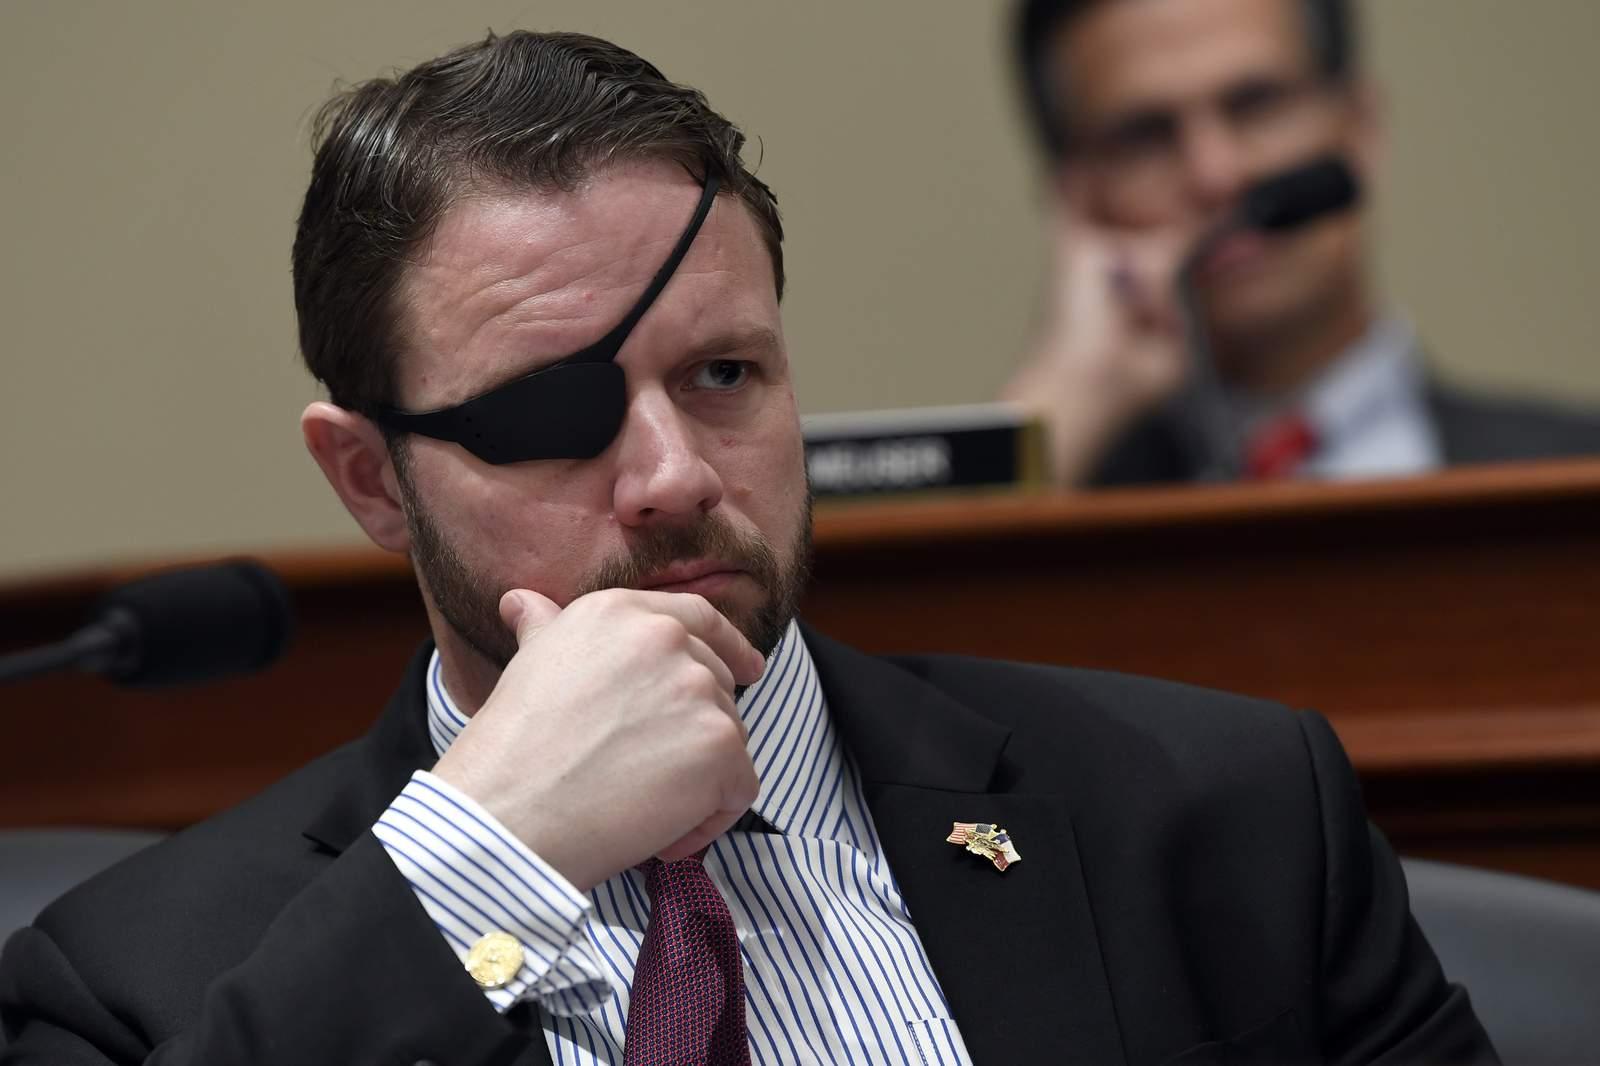 Pandemic politics ripple through Texas races, forcing U.S. Rep. Dan Crenshaw to defend his coronavirus response